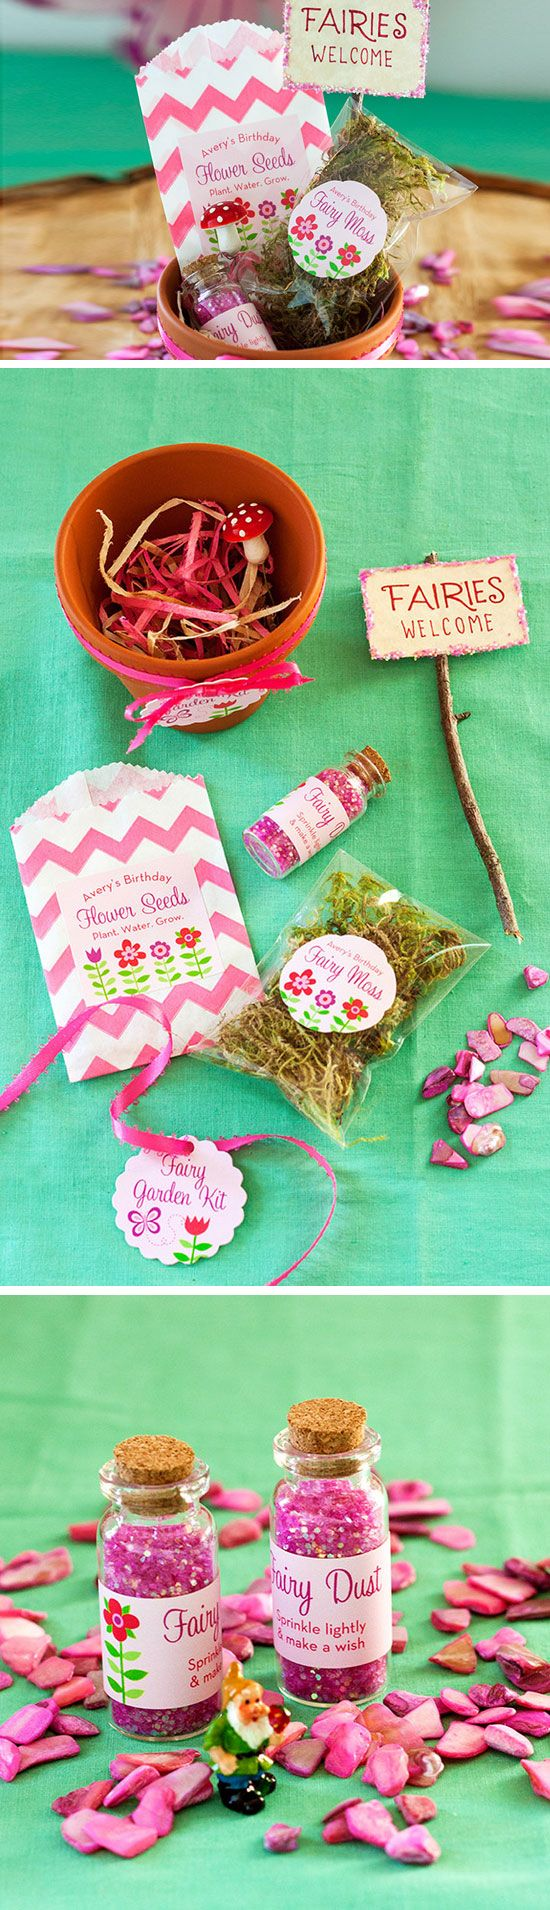 17 DIY Birthday Party Favors for Girls | DIY Birthday, Handmade baby ...